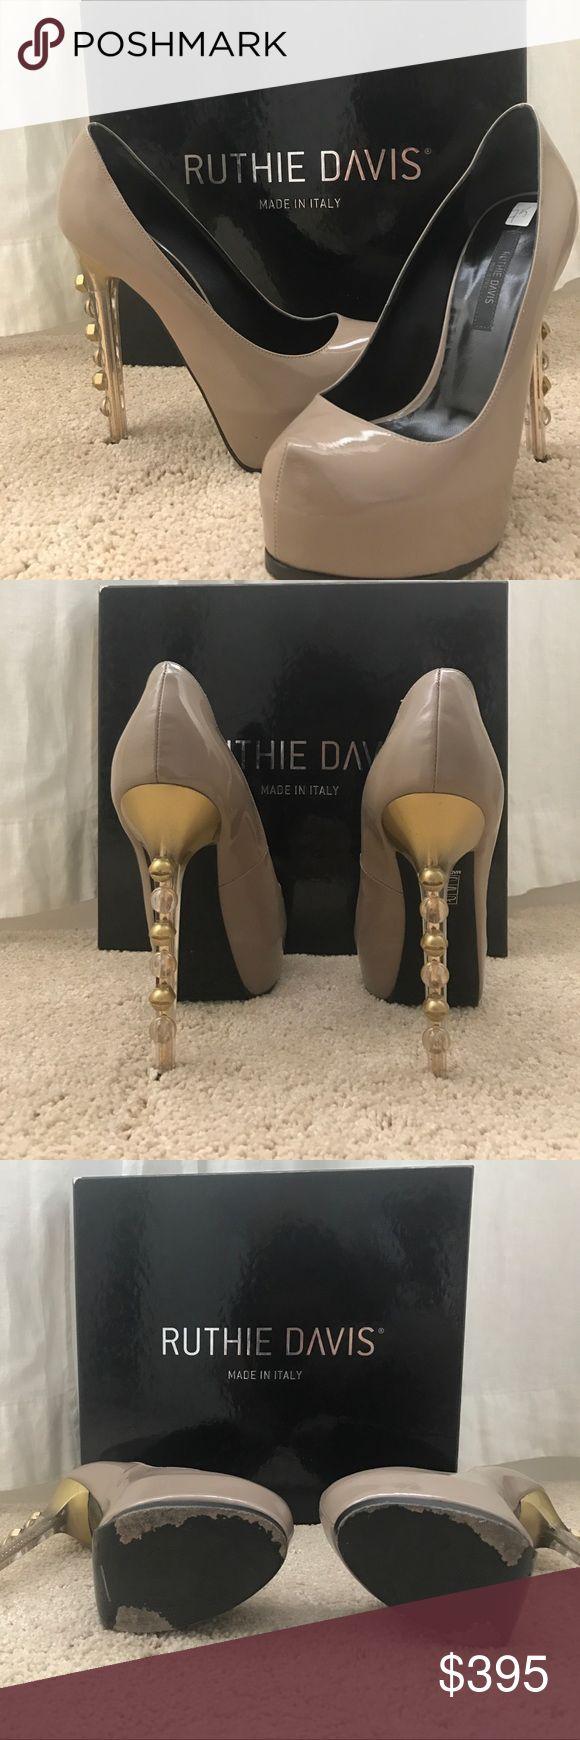 Ruthie Davis Implant Pumps Nude shoe with a funky heel Ruthie Davis Shoes Platforms